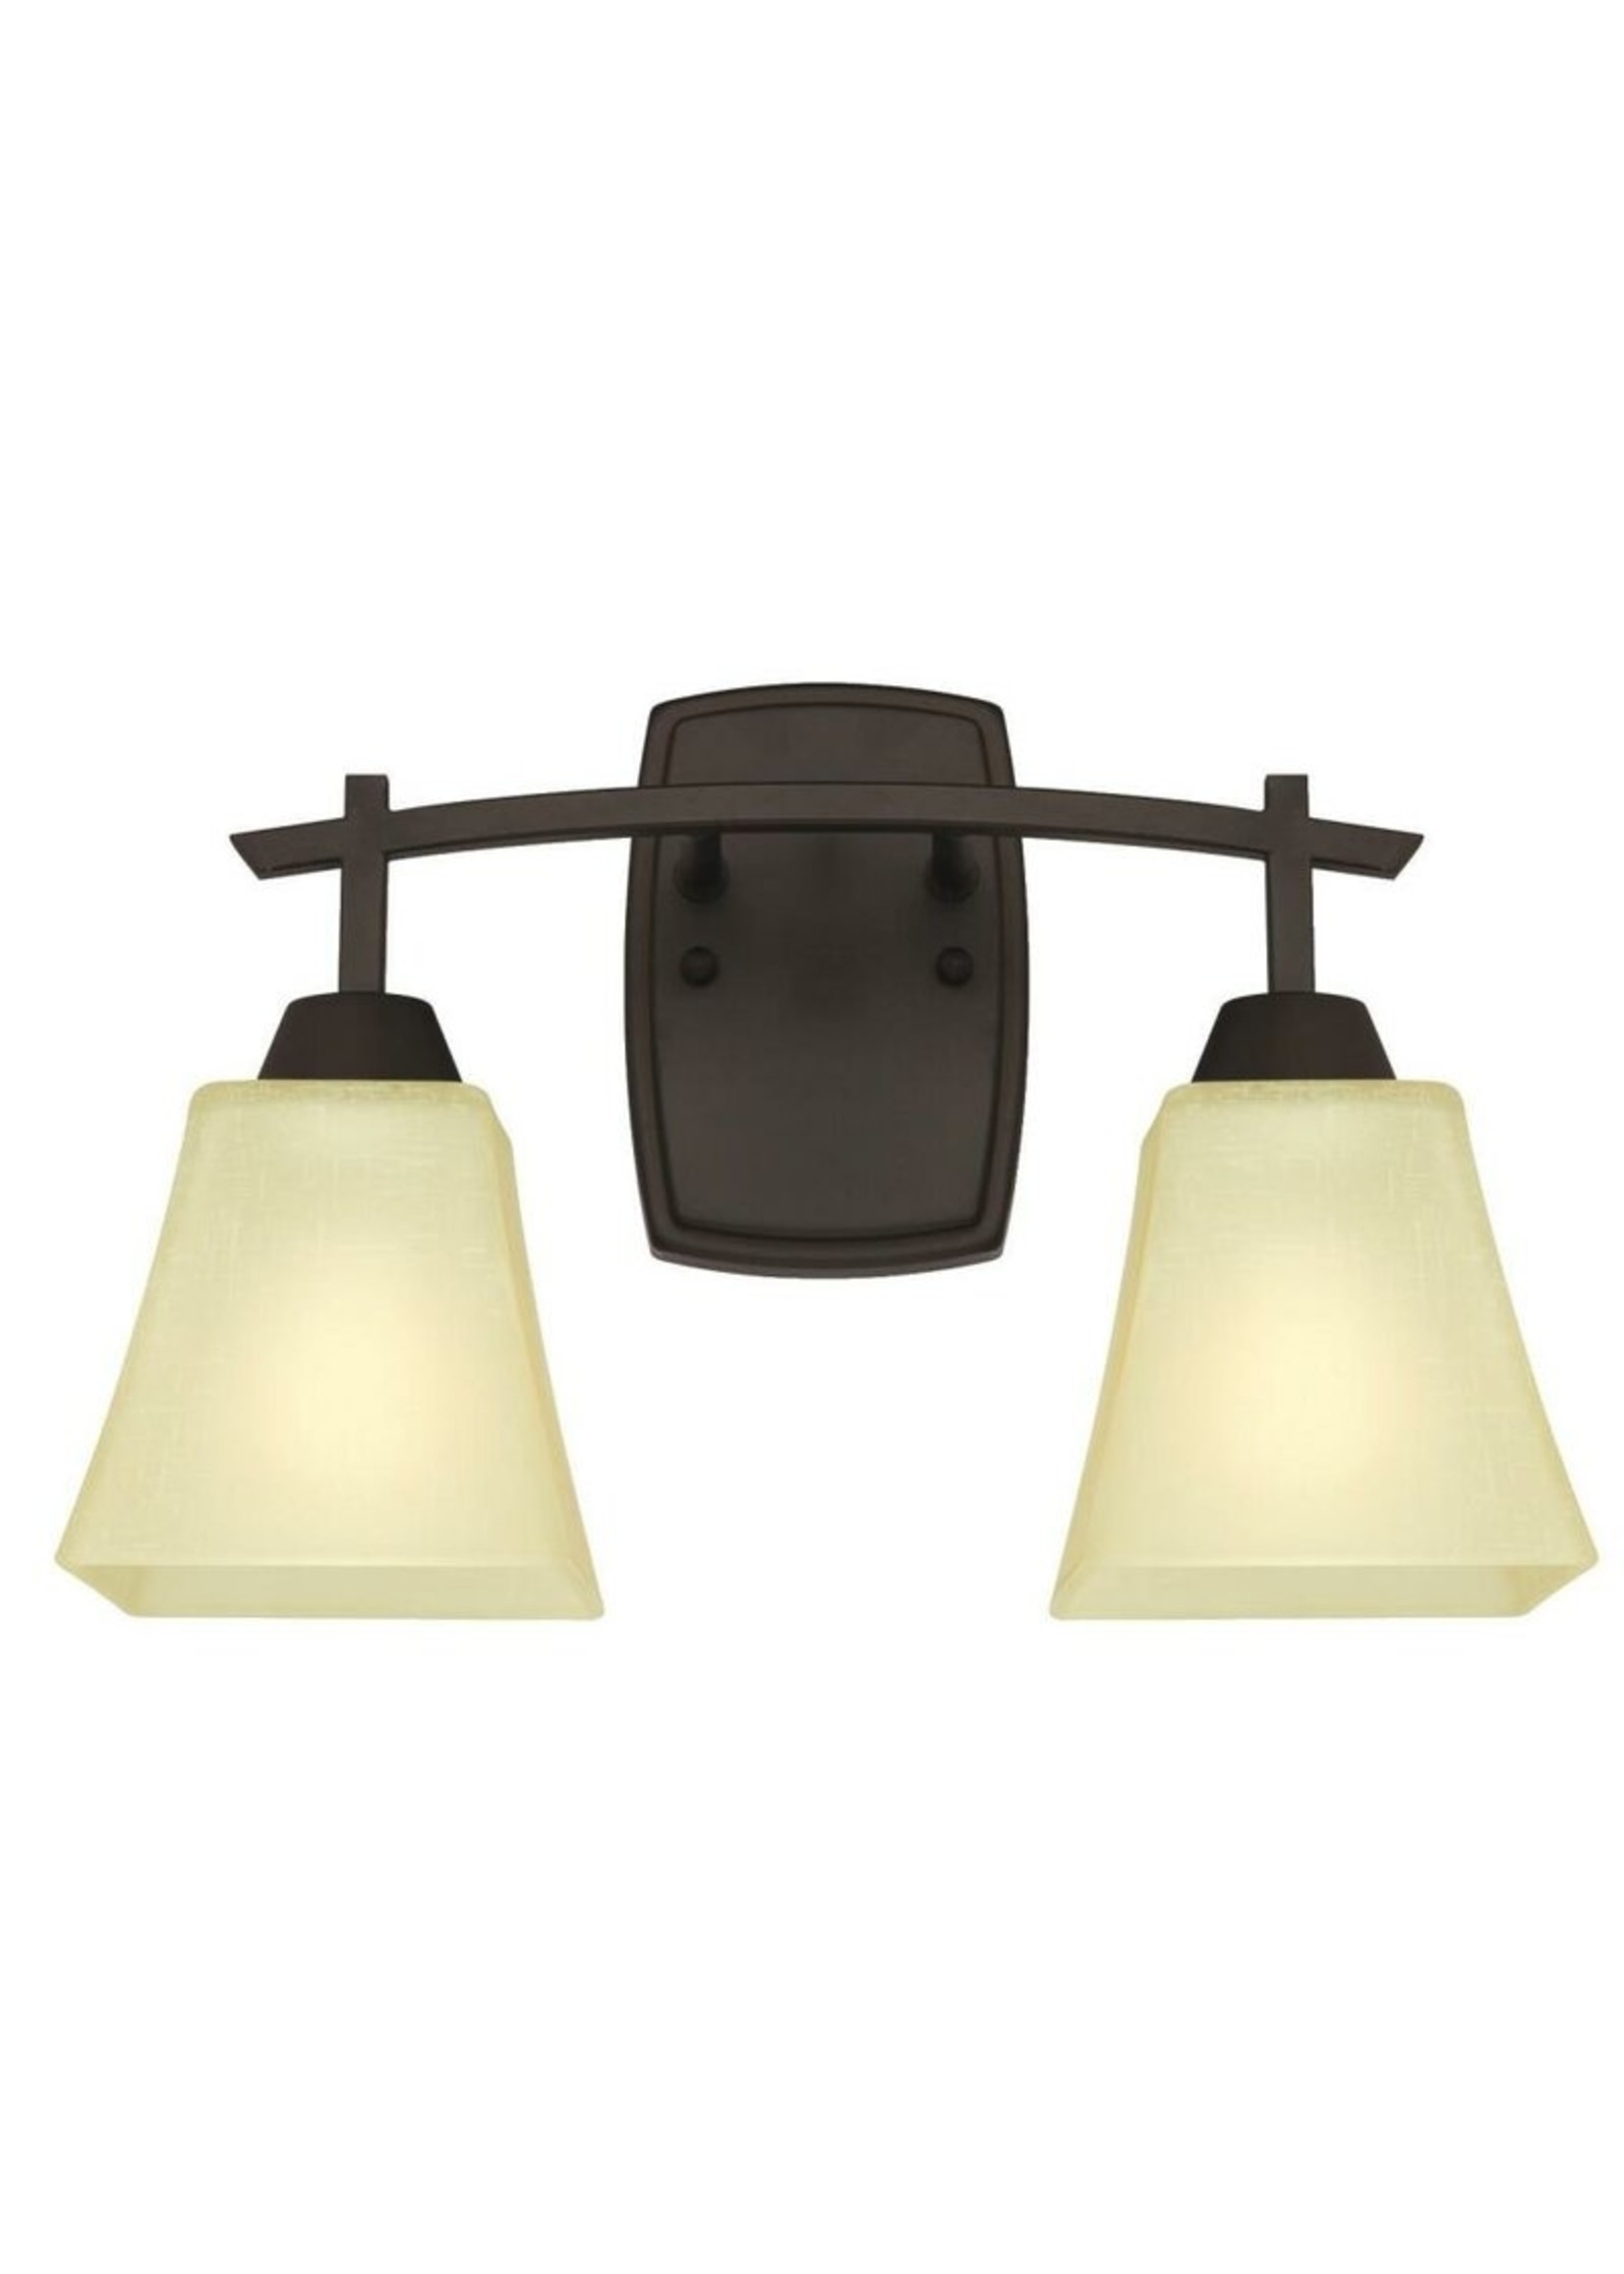 *Metzger 2-Light Dimmable Oil Rubbed Bronze Vanity Light